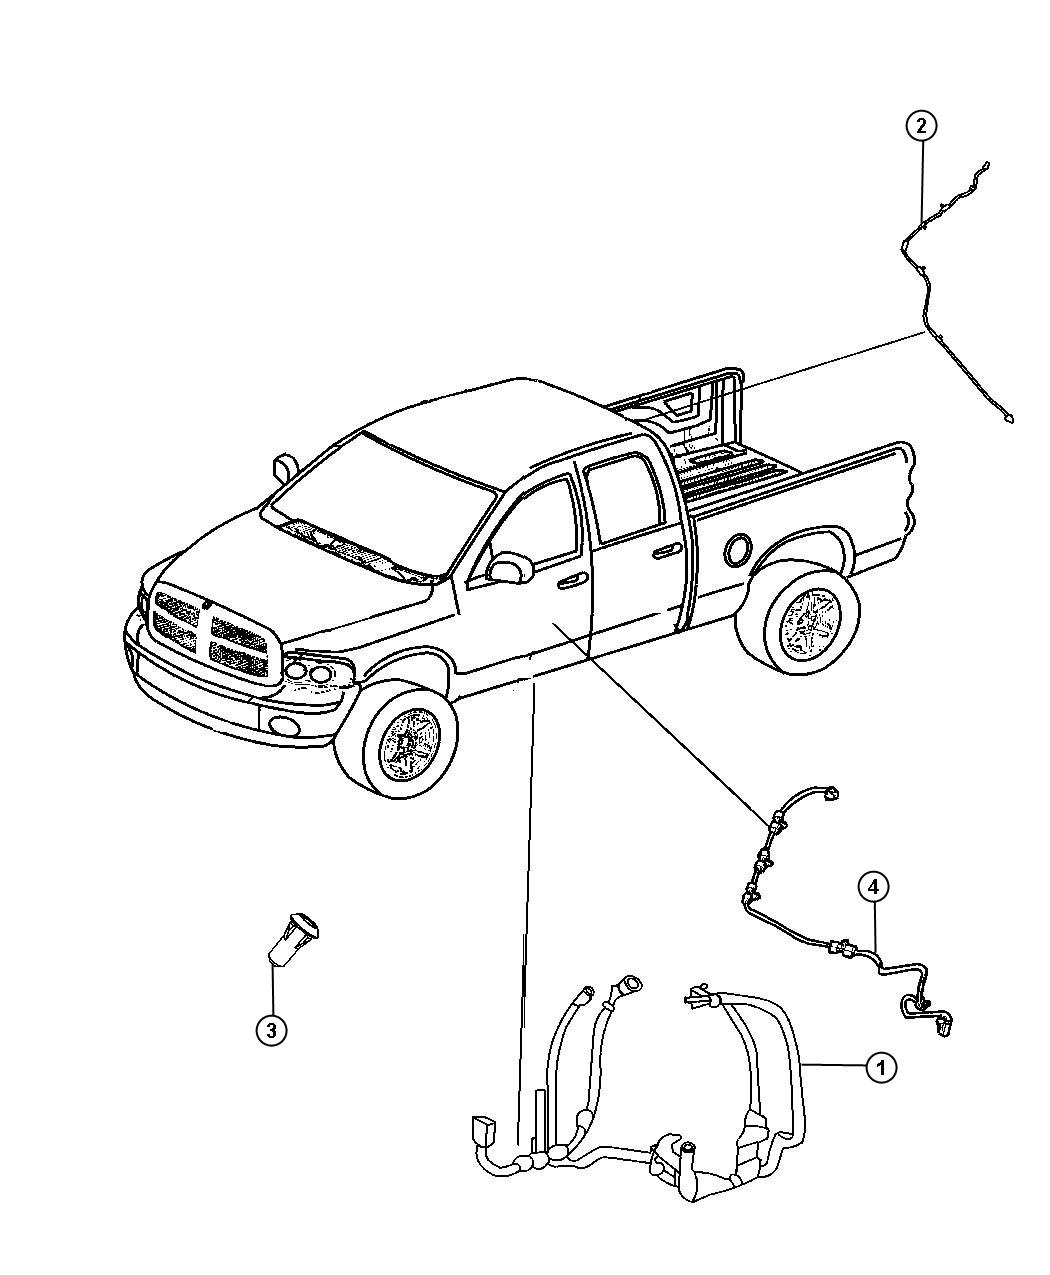 Ram Wiring Body Dual Rear Wheels 6 Speakers